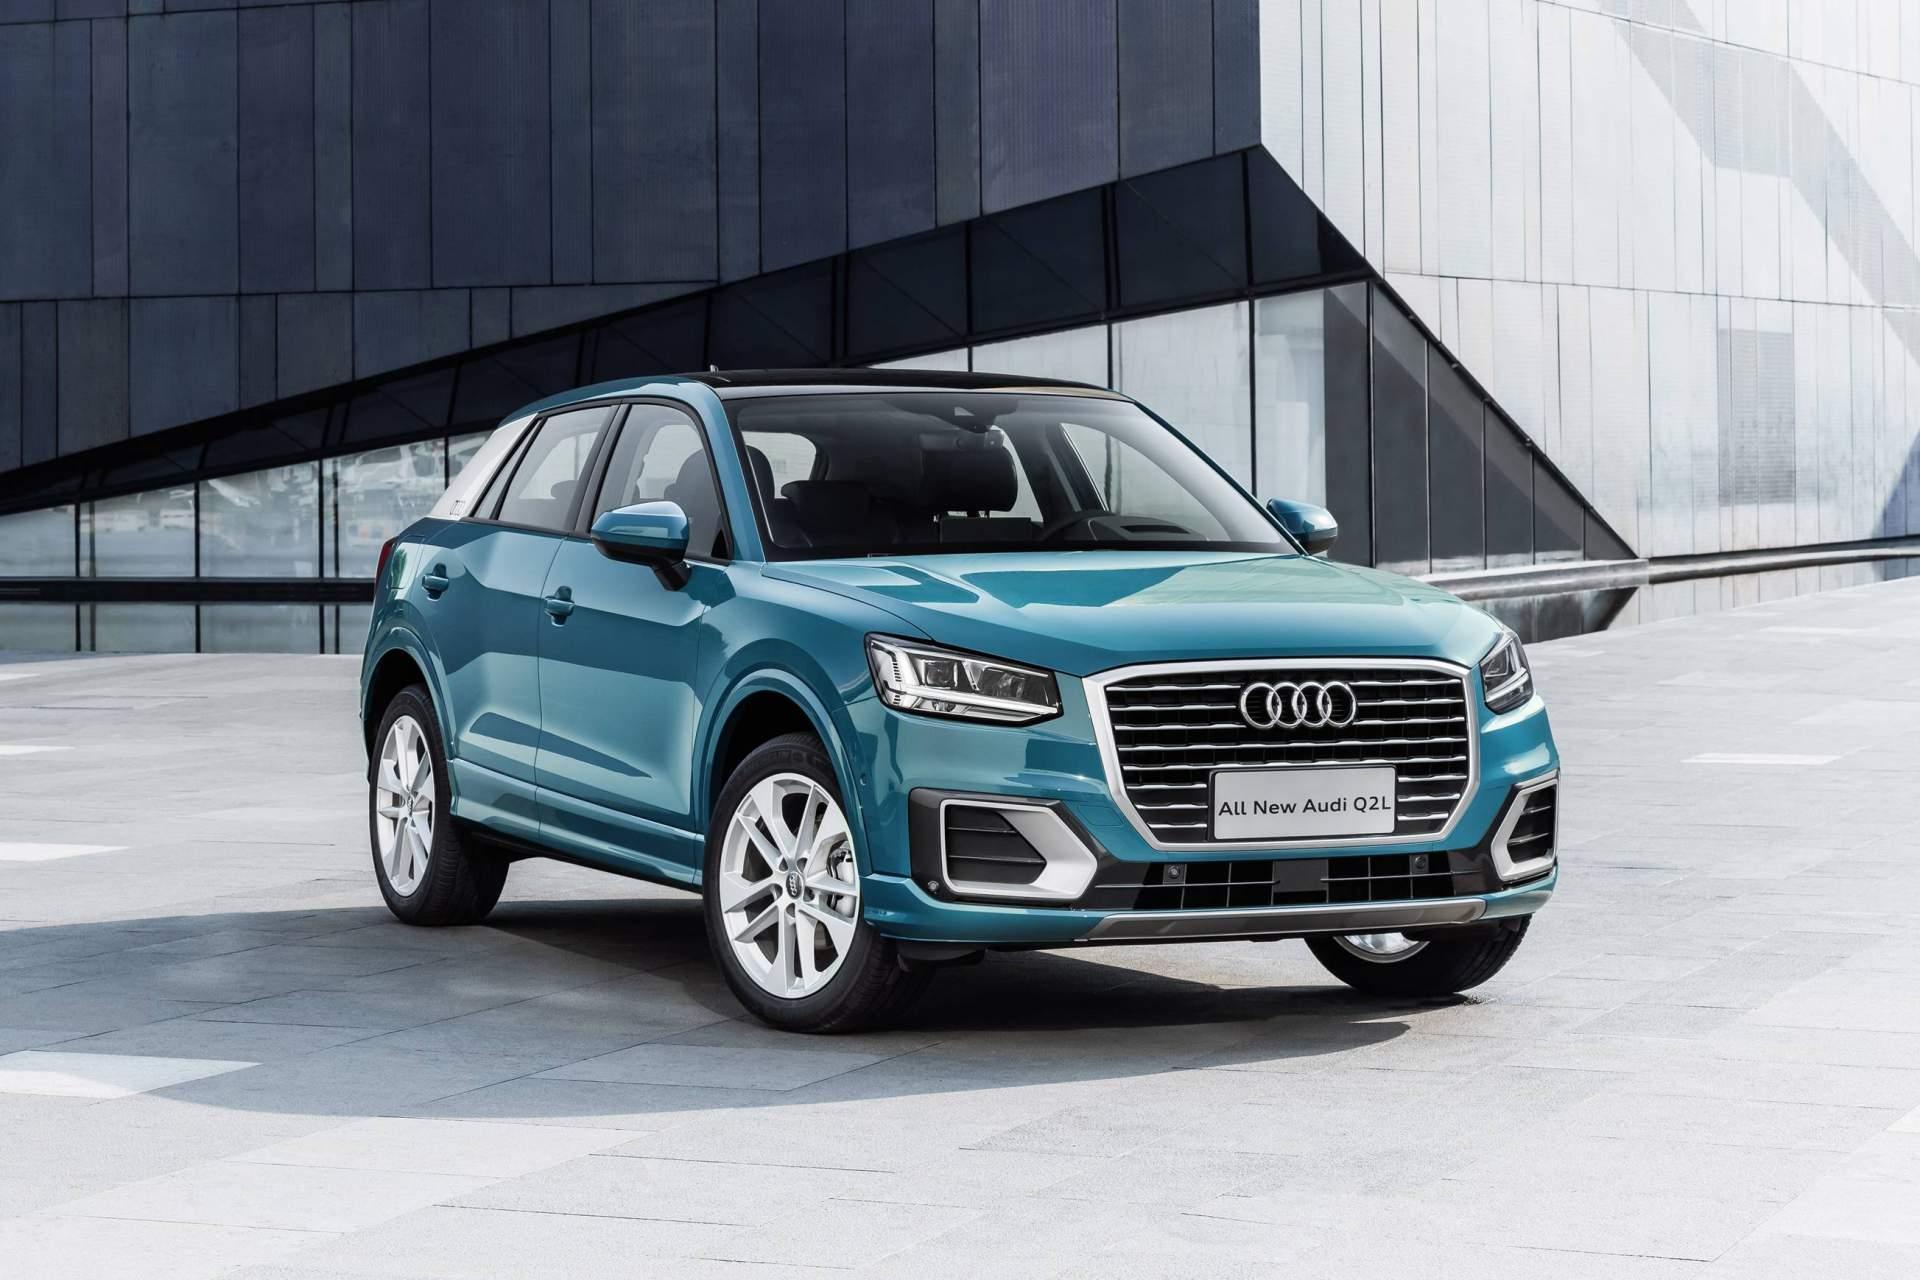 Audi_Q2_L_0032